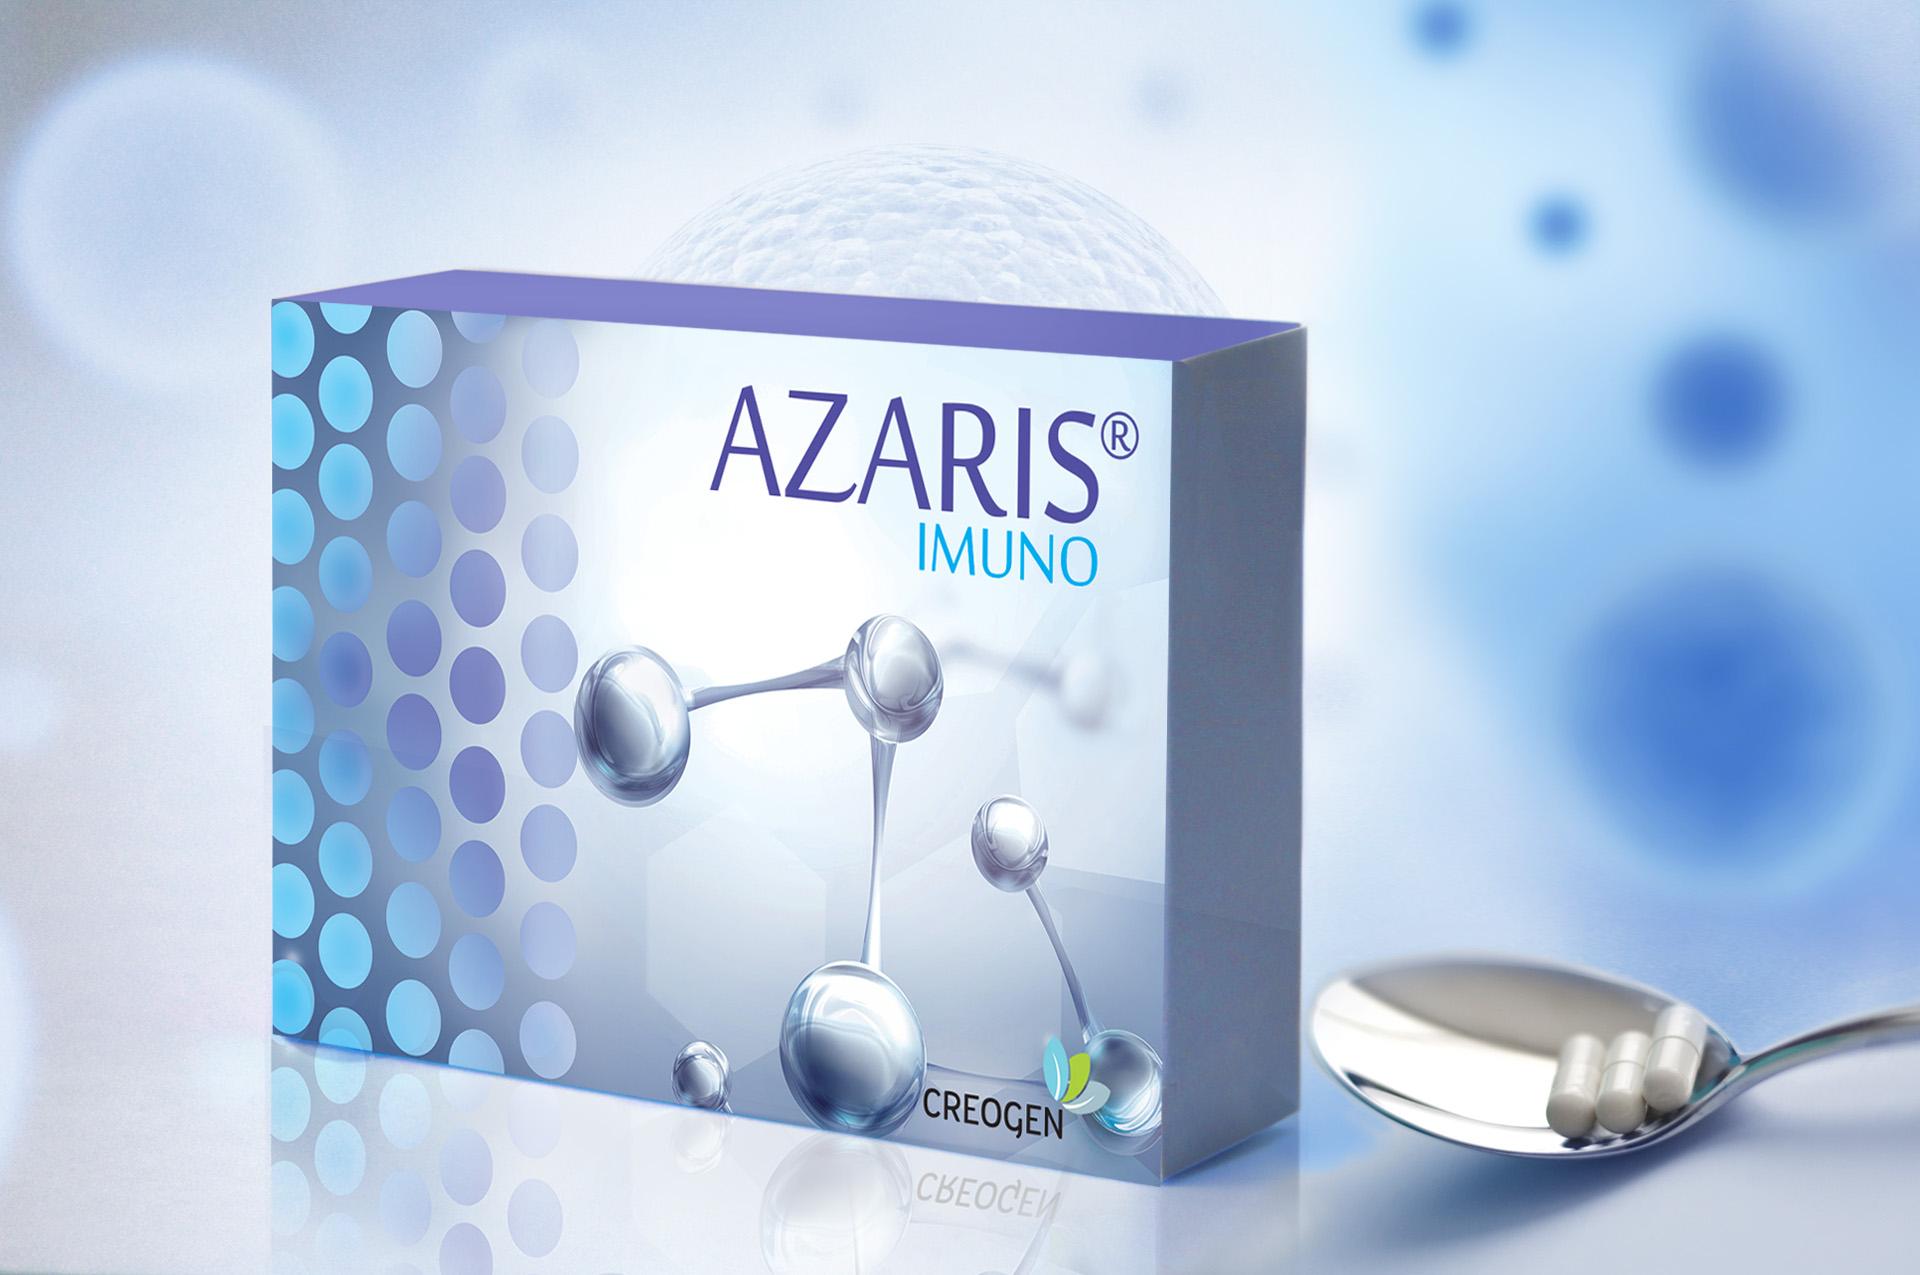 Azaris® IMUNO